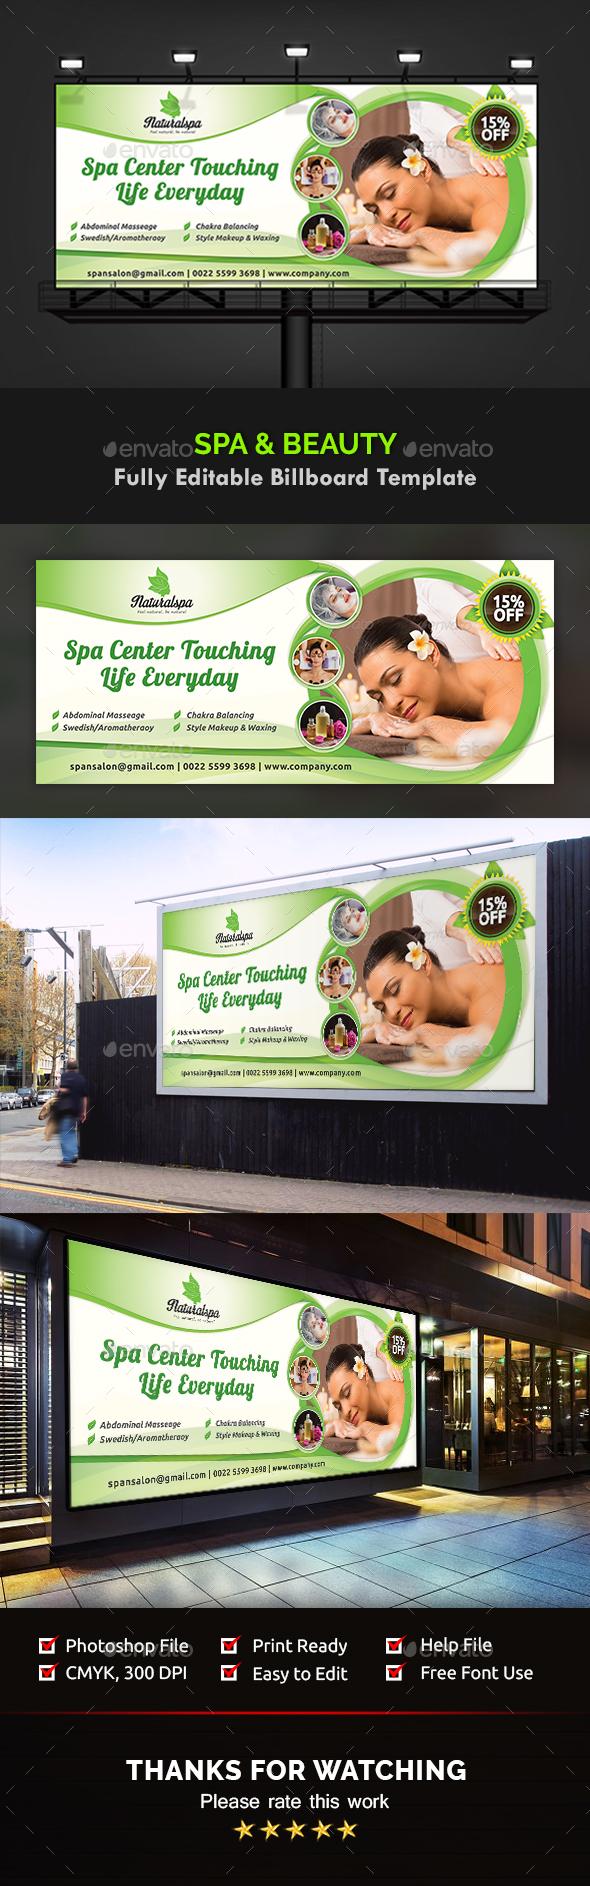 GraphicRiver Spa & Beauty Billboard Templates 20777085